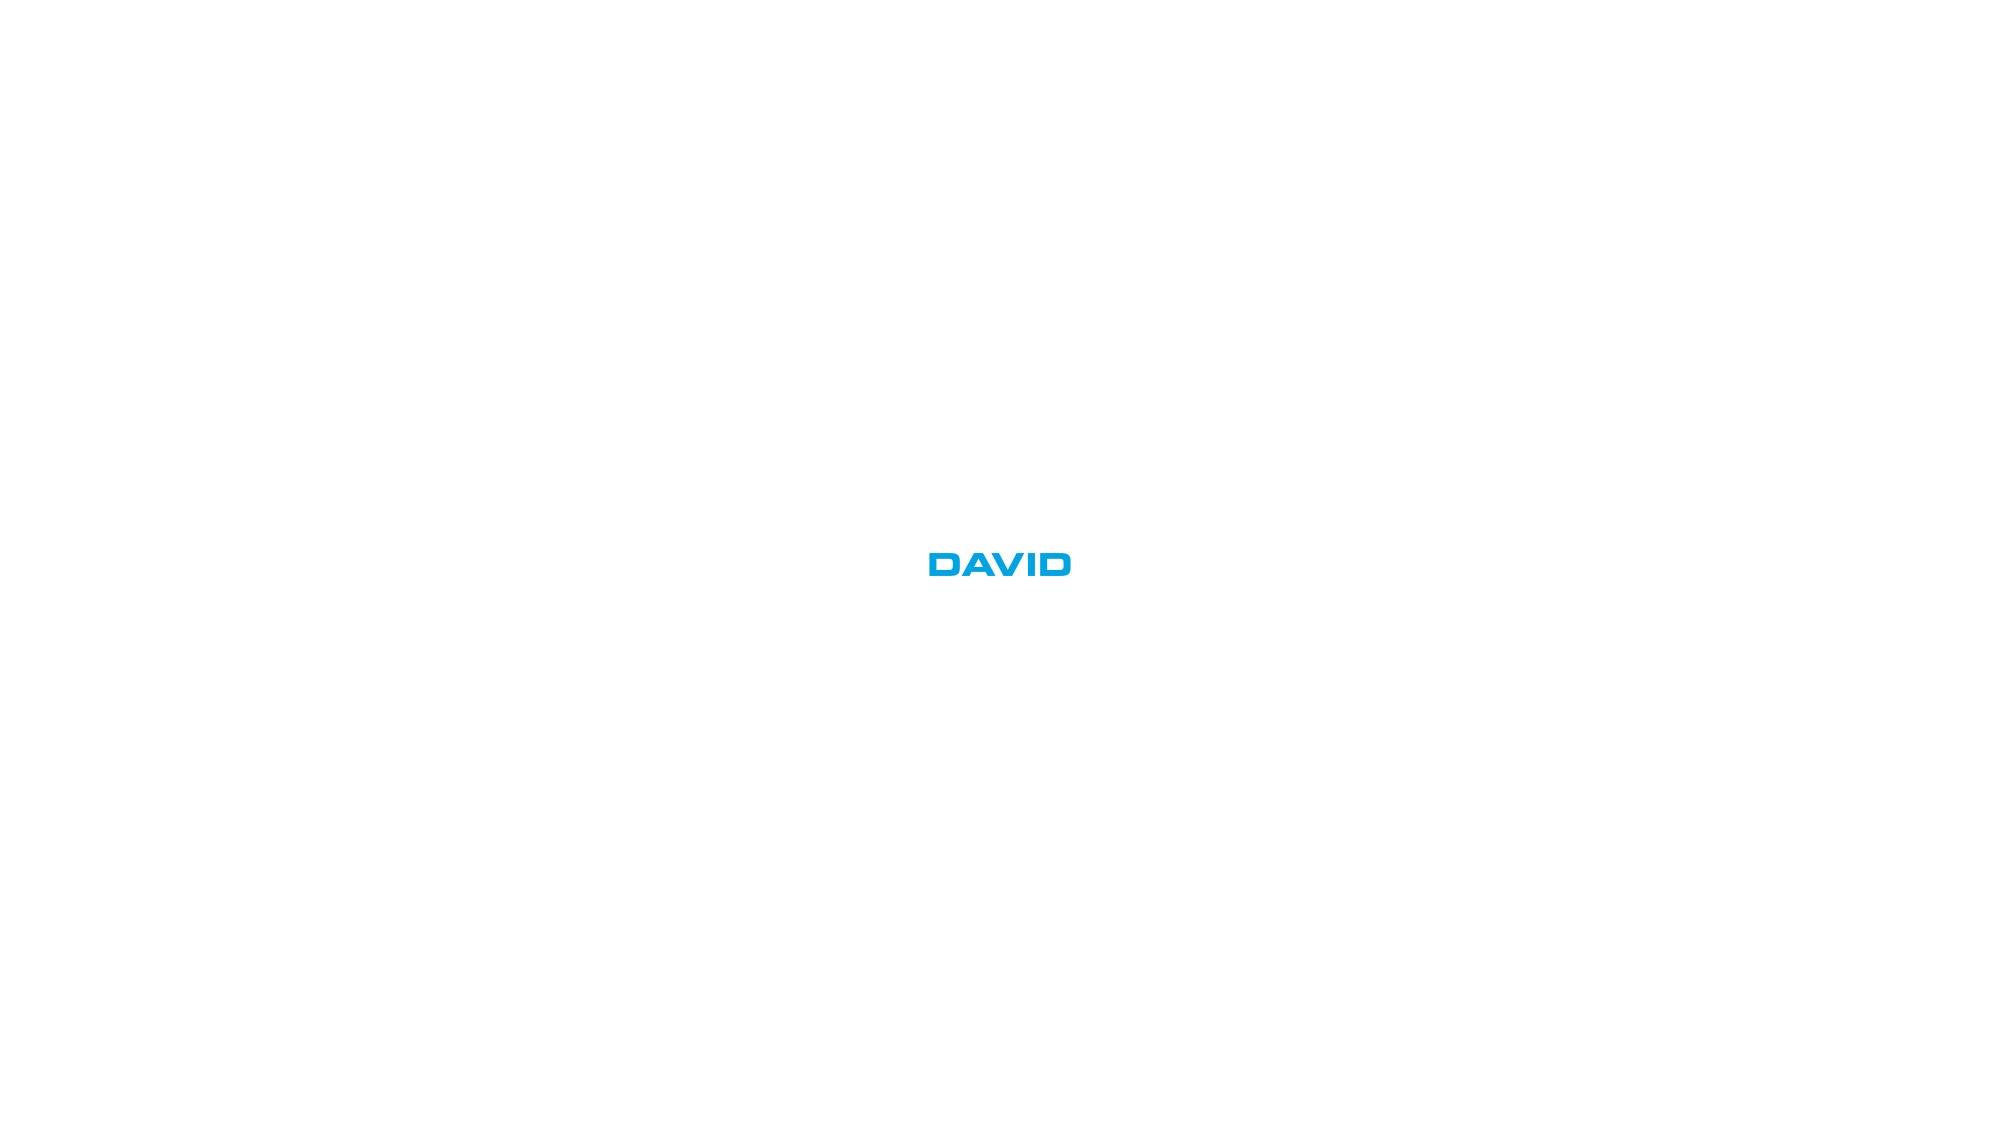 David Health 1